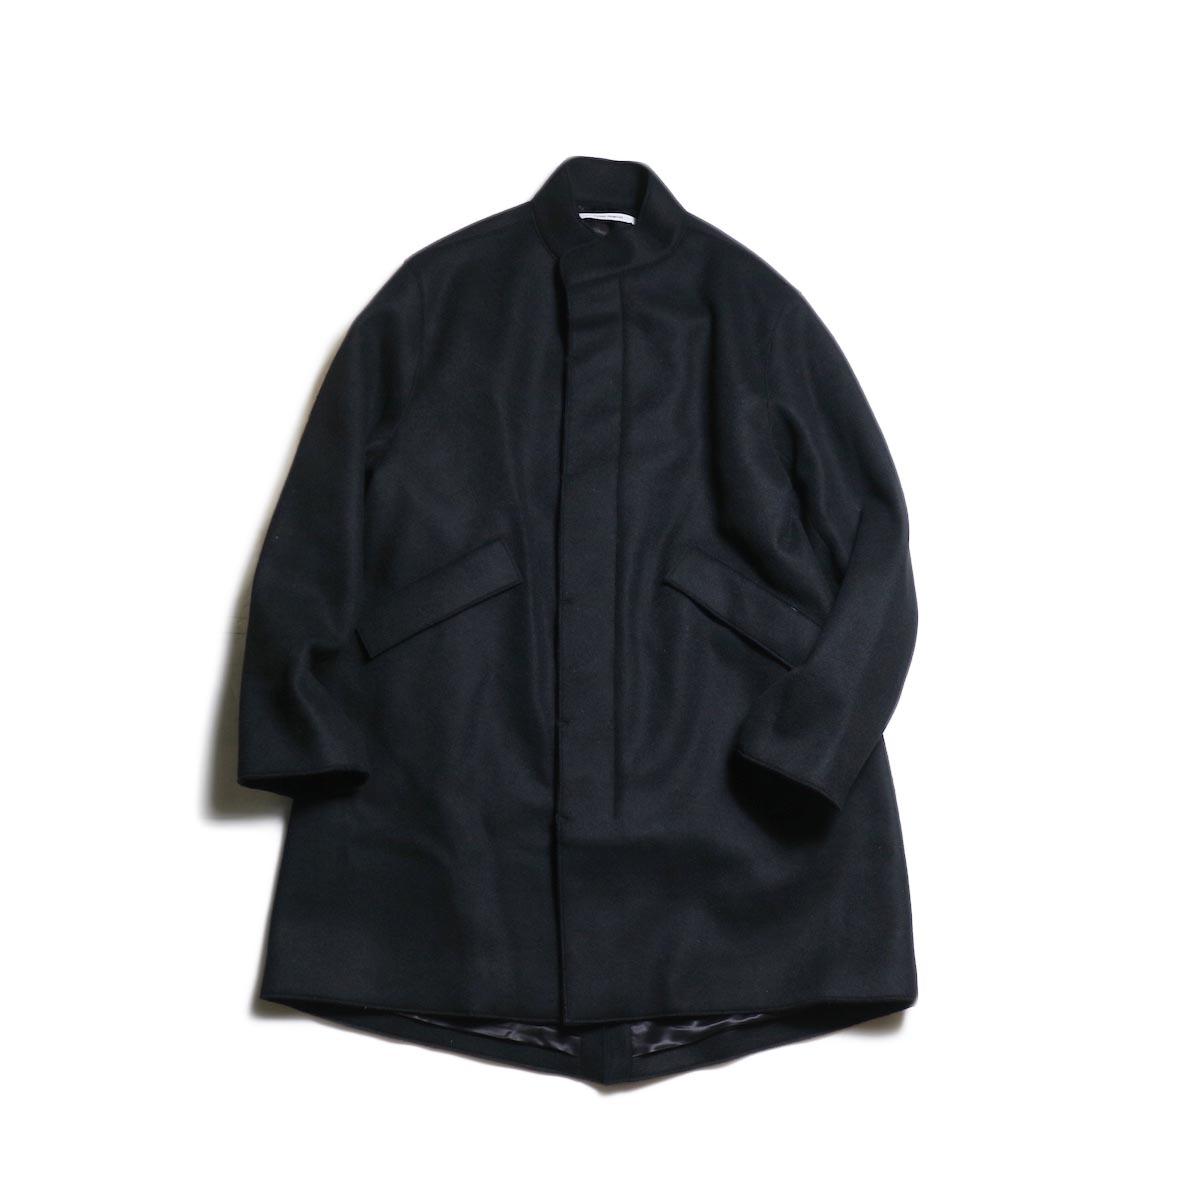 FUTURE PRIMITIVE / FP SIMPLIFIED FISHTAIL COAT (Black)